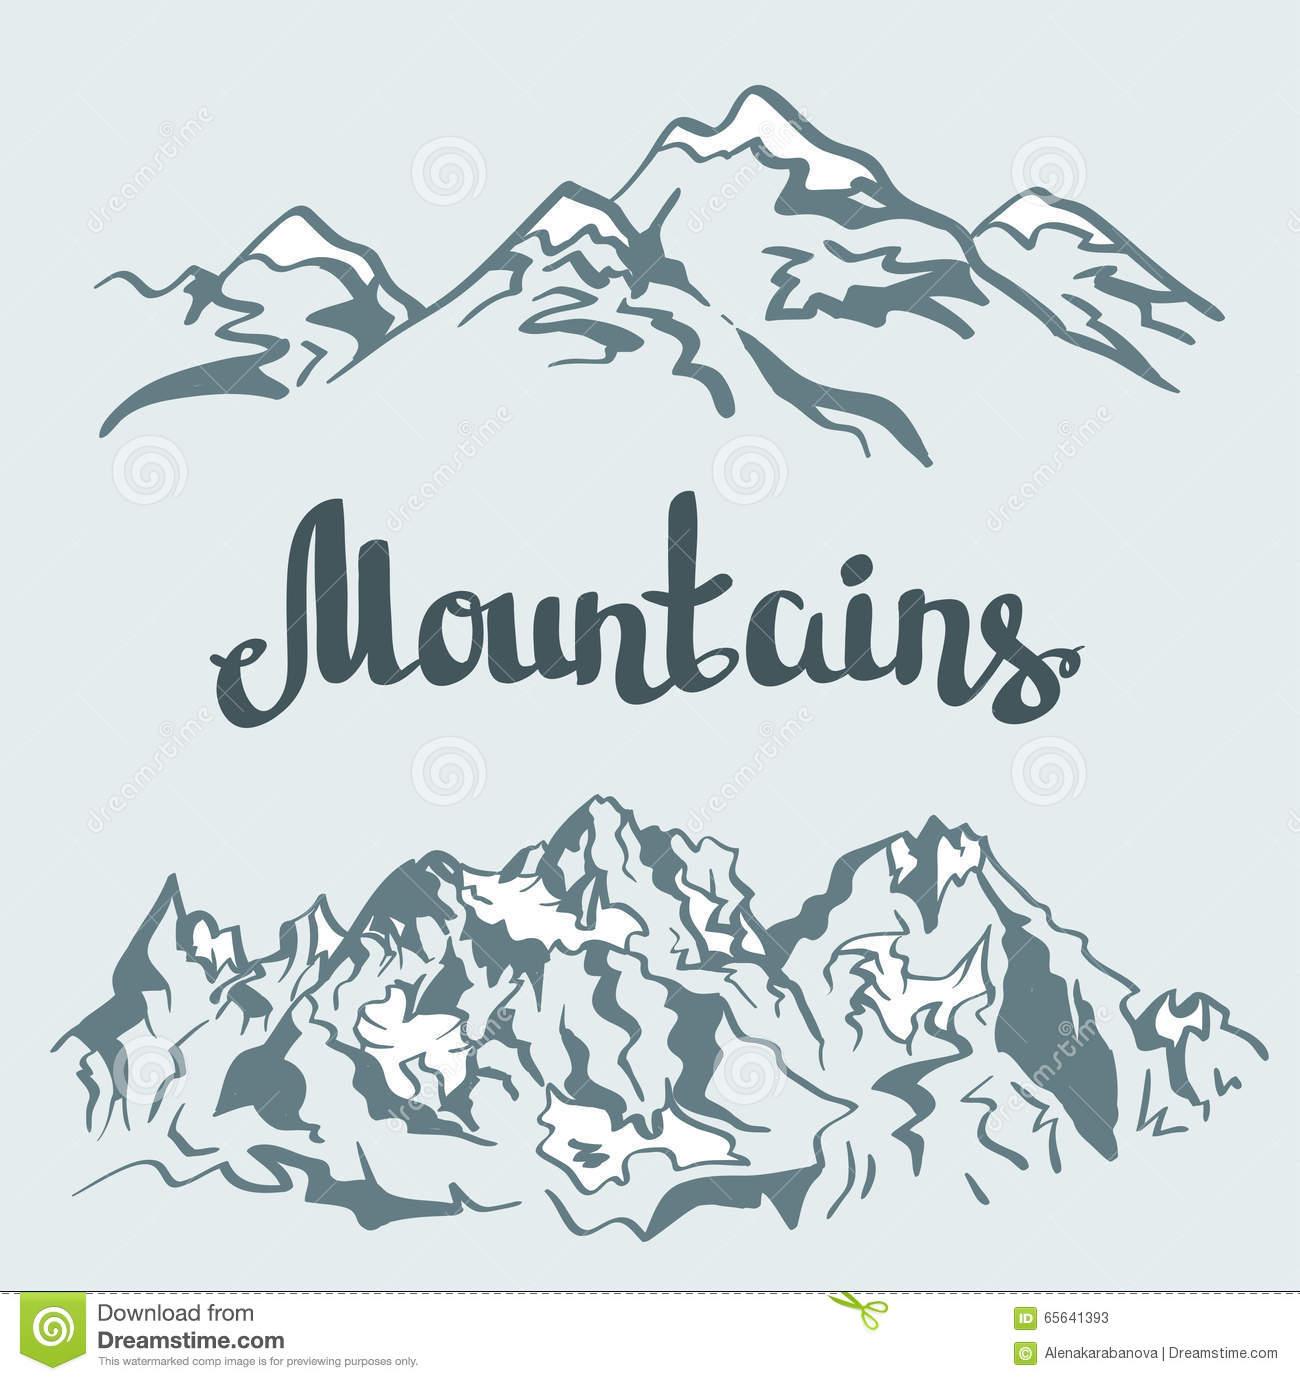 Himalaya Range clipart #11, Download drawings